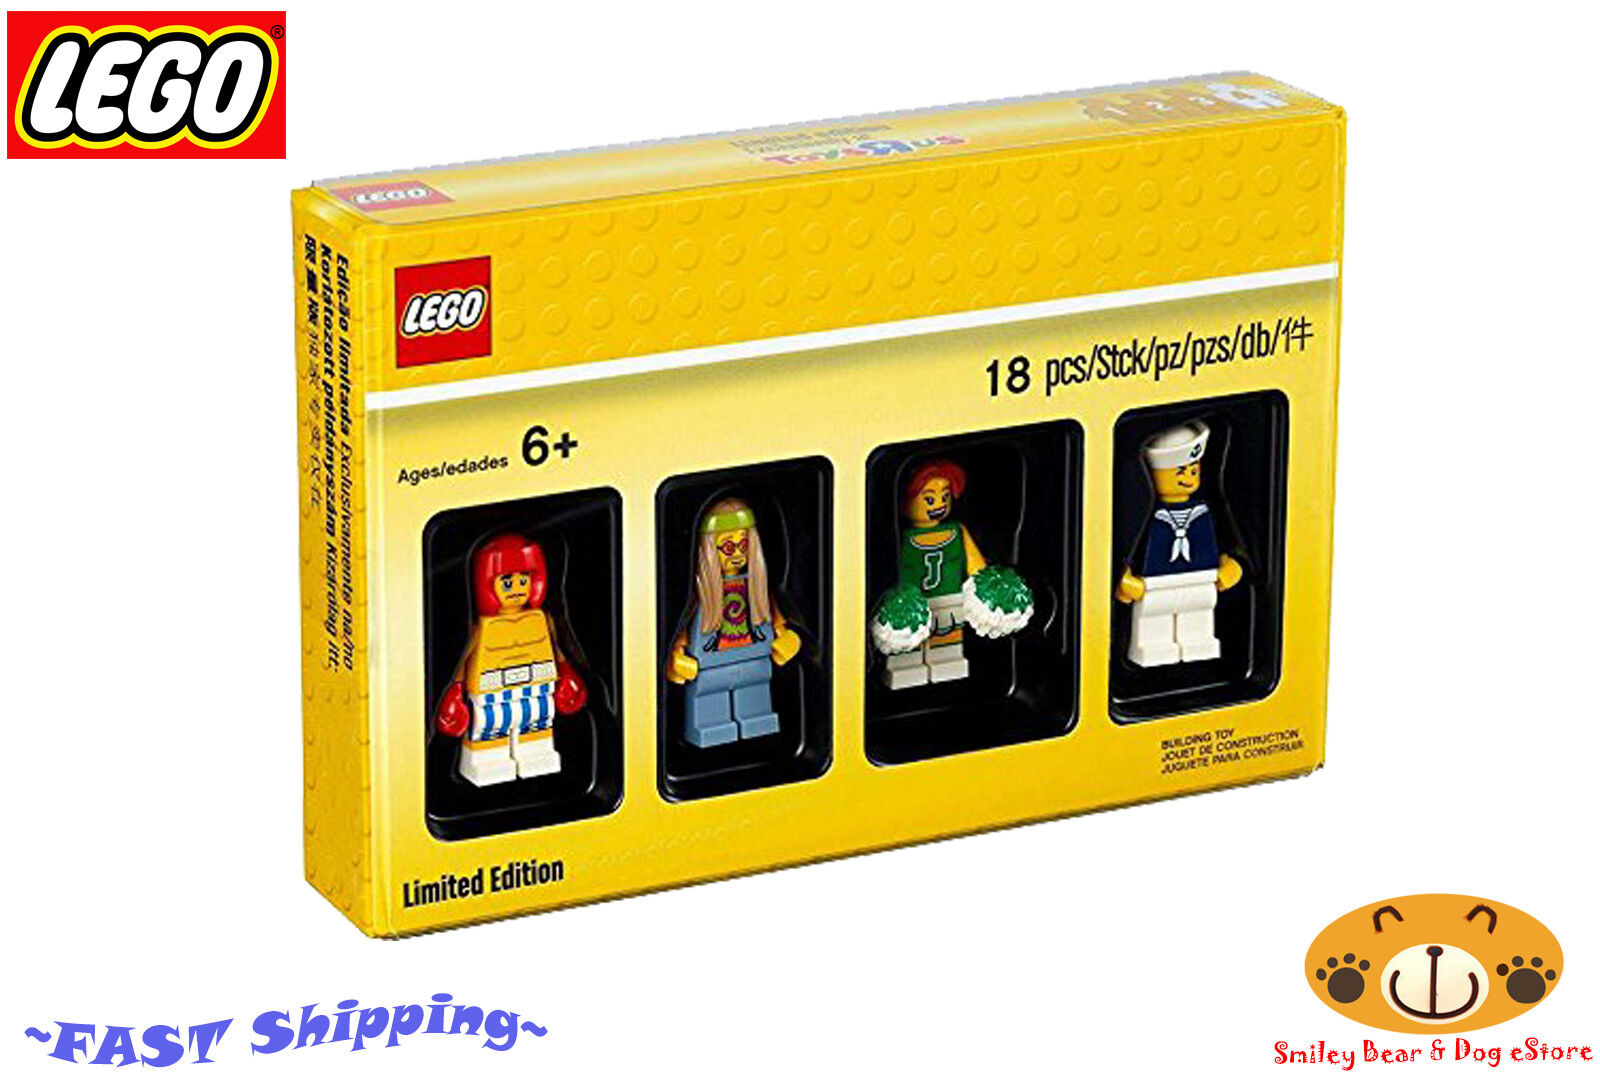 LEGO 5004941 MINIFIGURE SET LIMITED EDITION CHEERLEADER   BOXE   SAILOR   HIPPIE